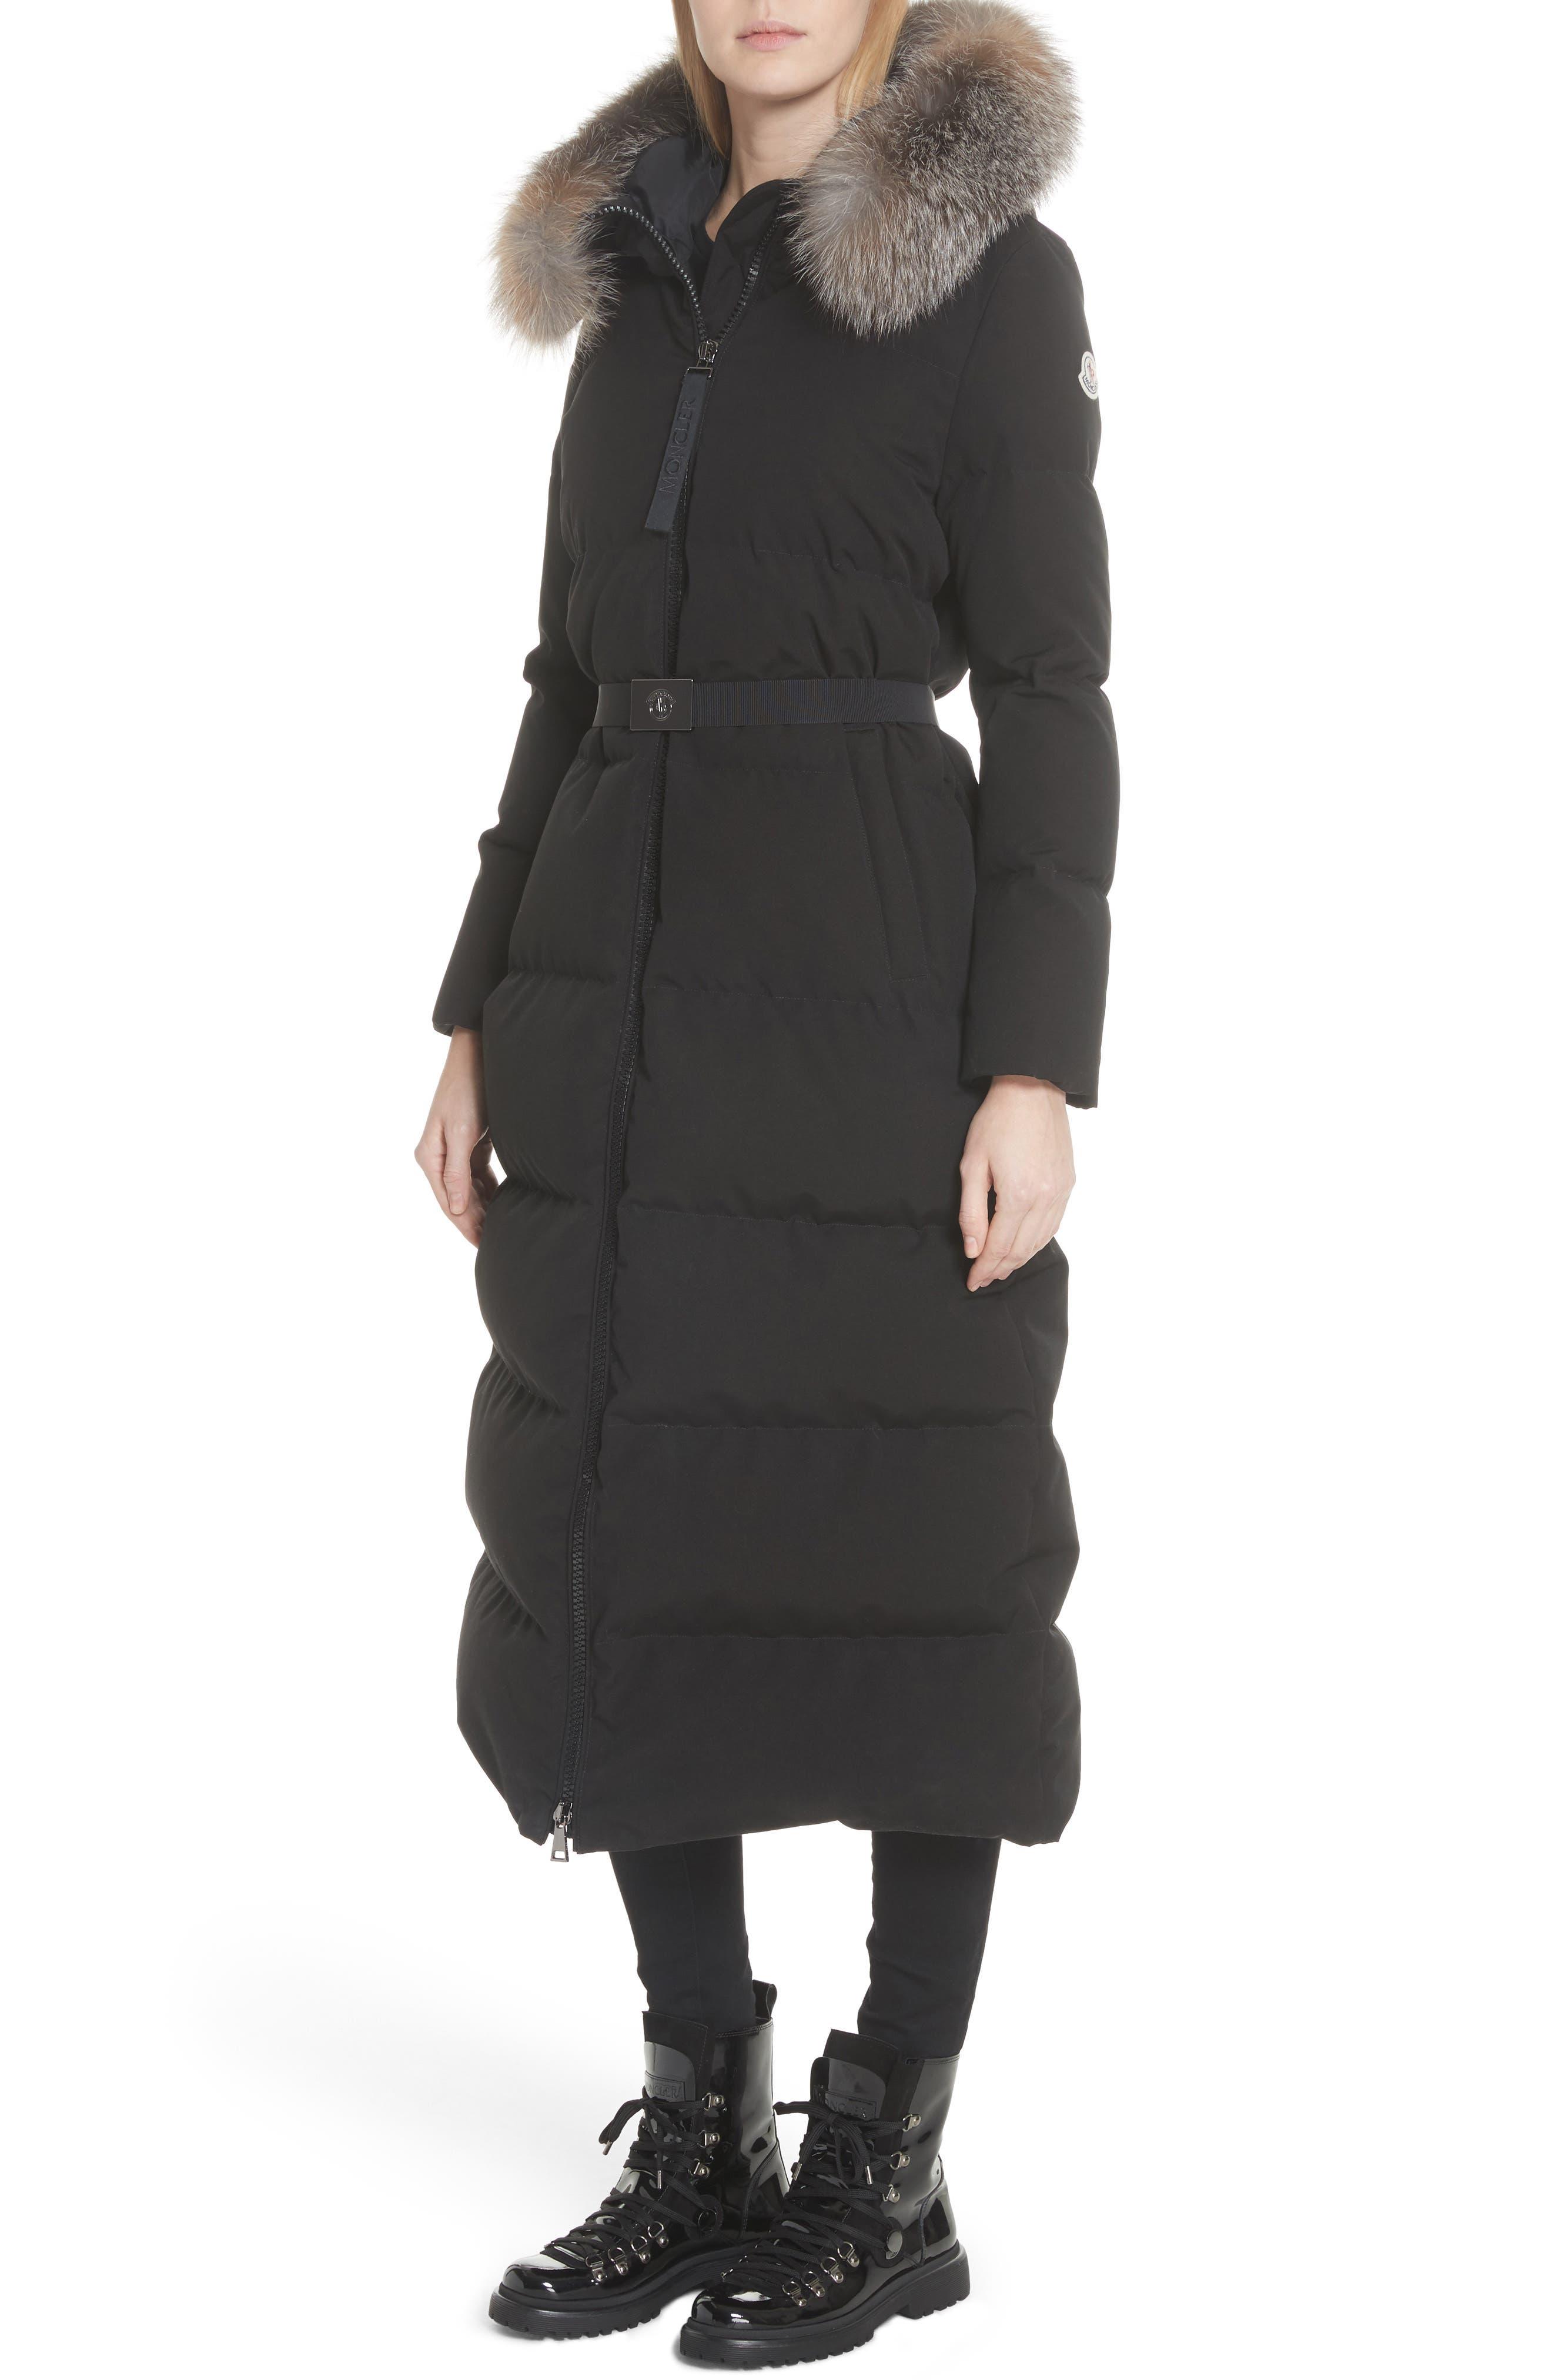 Bernache Hooded Down Coat with Removable Genuine Fox Fur Trim,                             Alternate thumbnail 4, color,                             Black